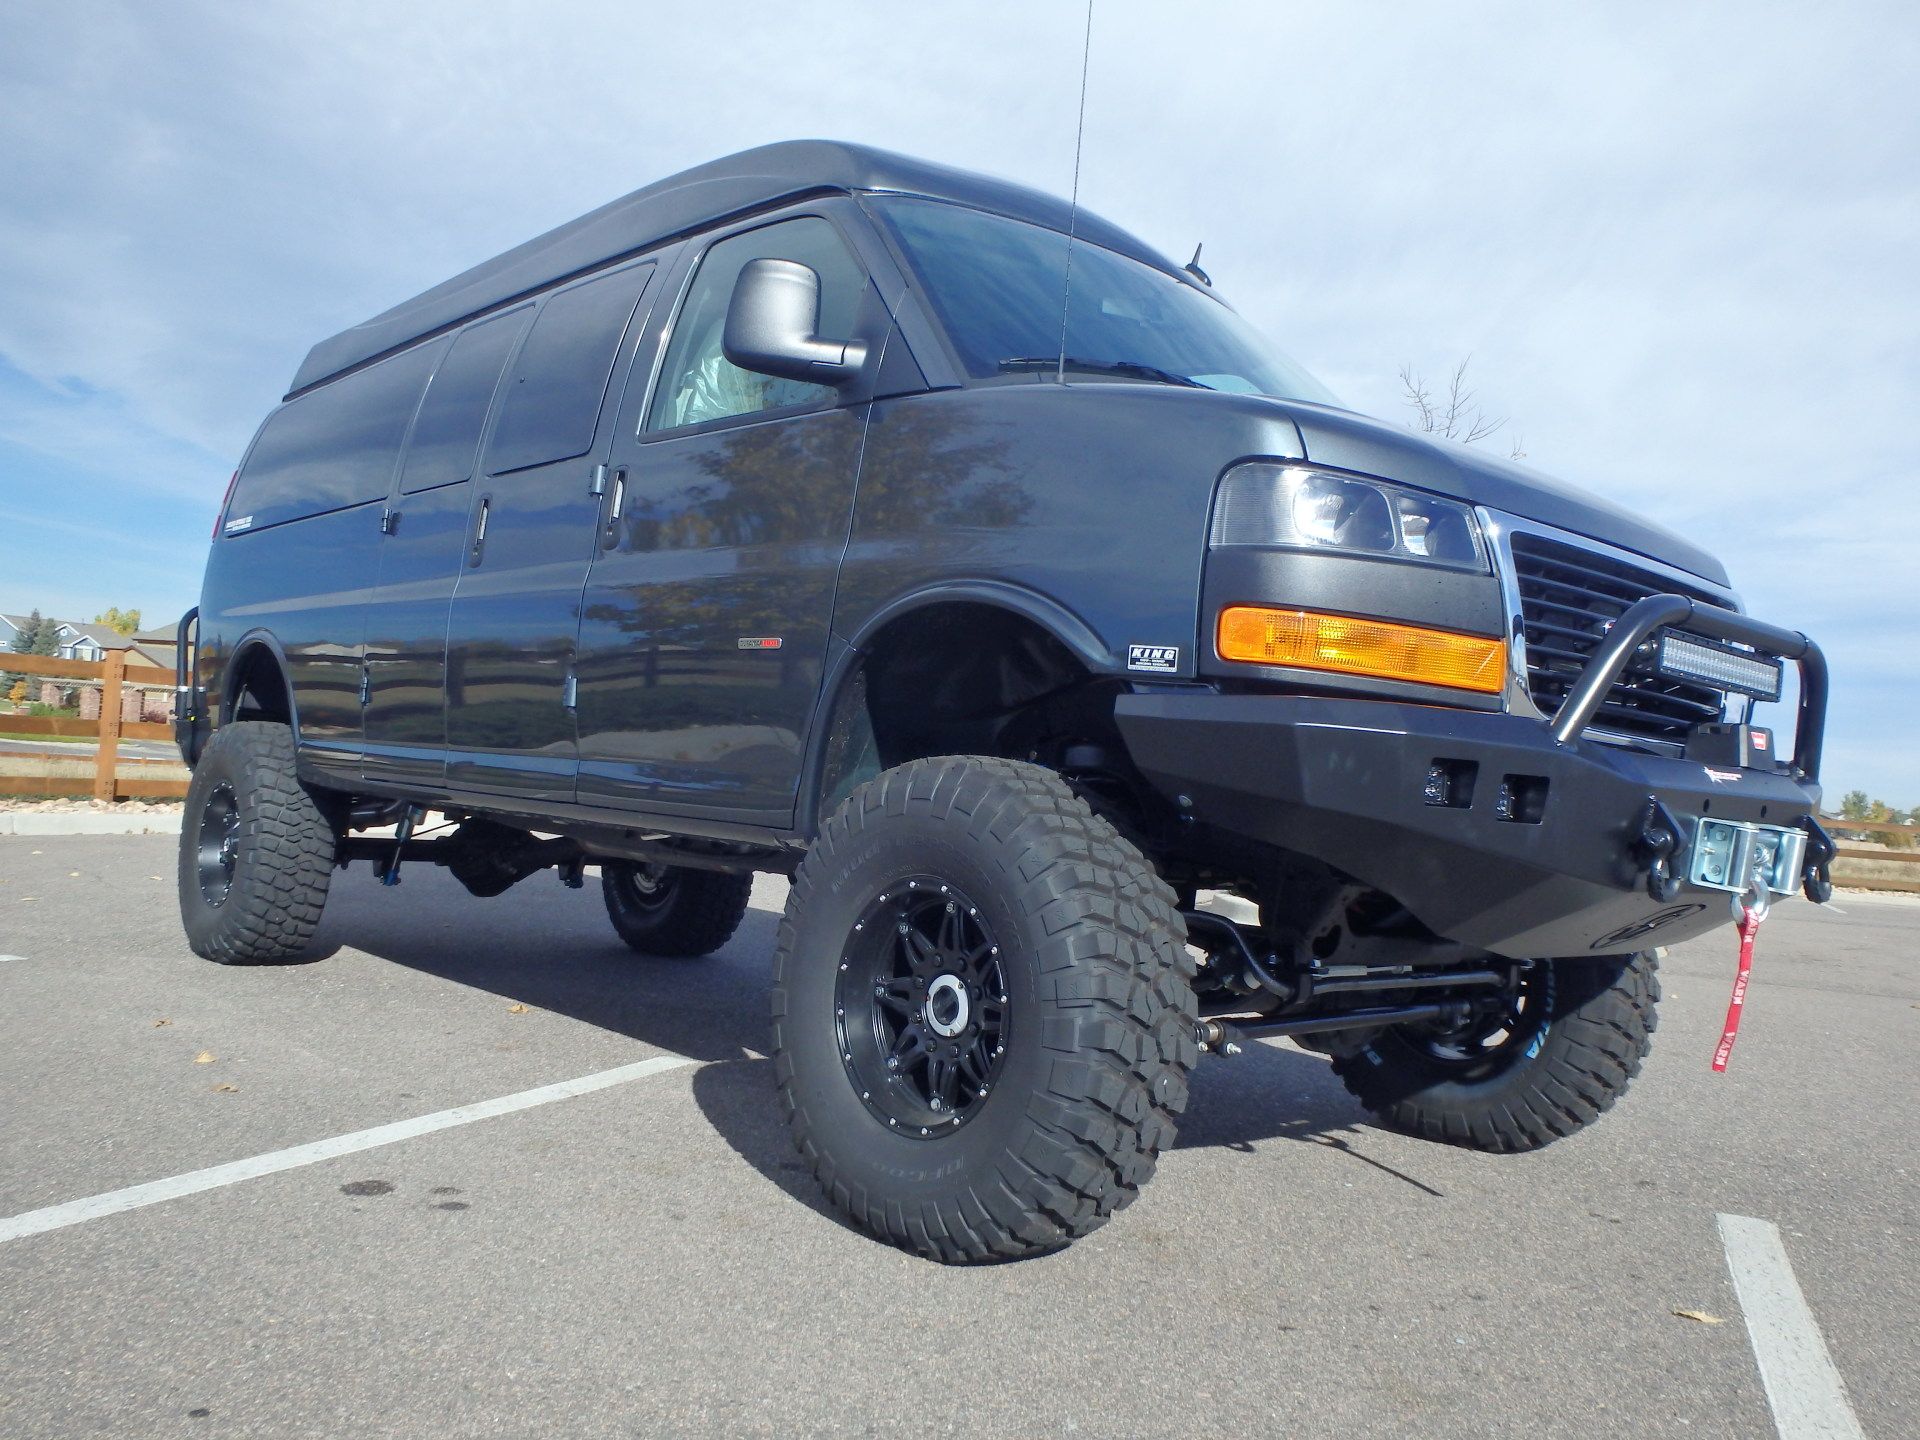 4x4 Chevy Express Passenger Van